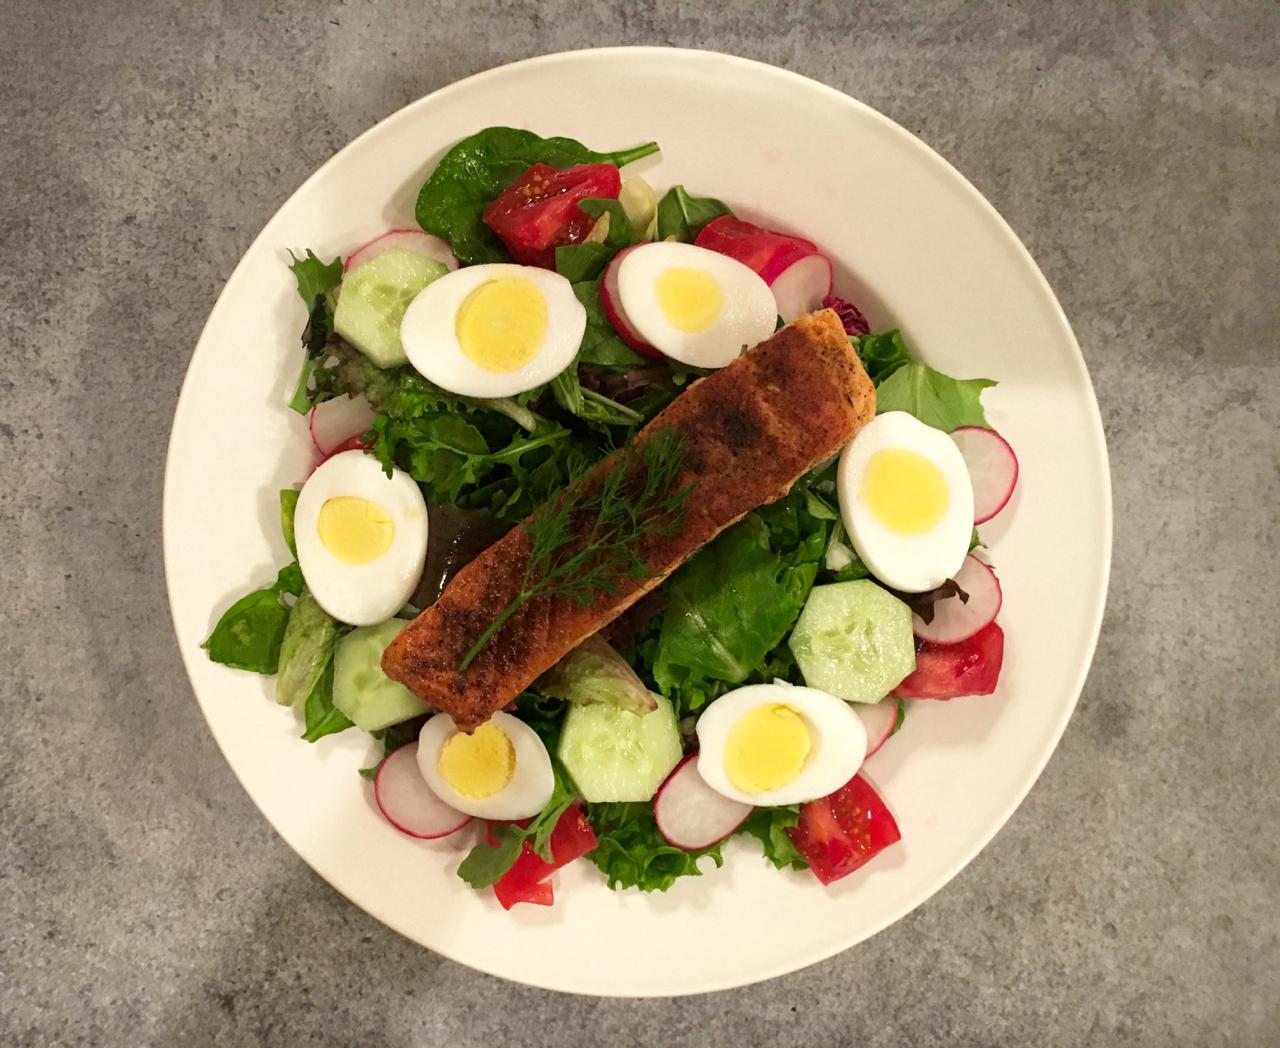 Blackened Salmon Salad With Yogurt Dill Dressing